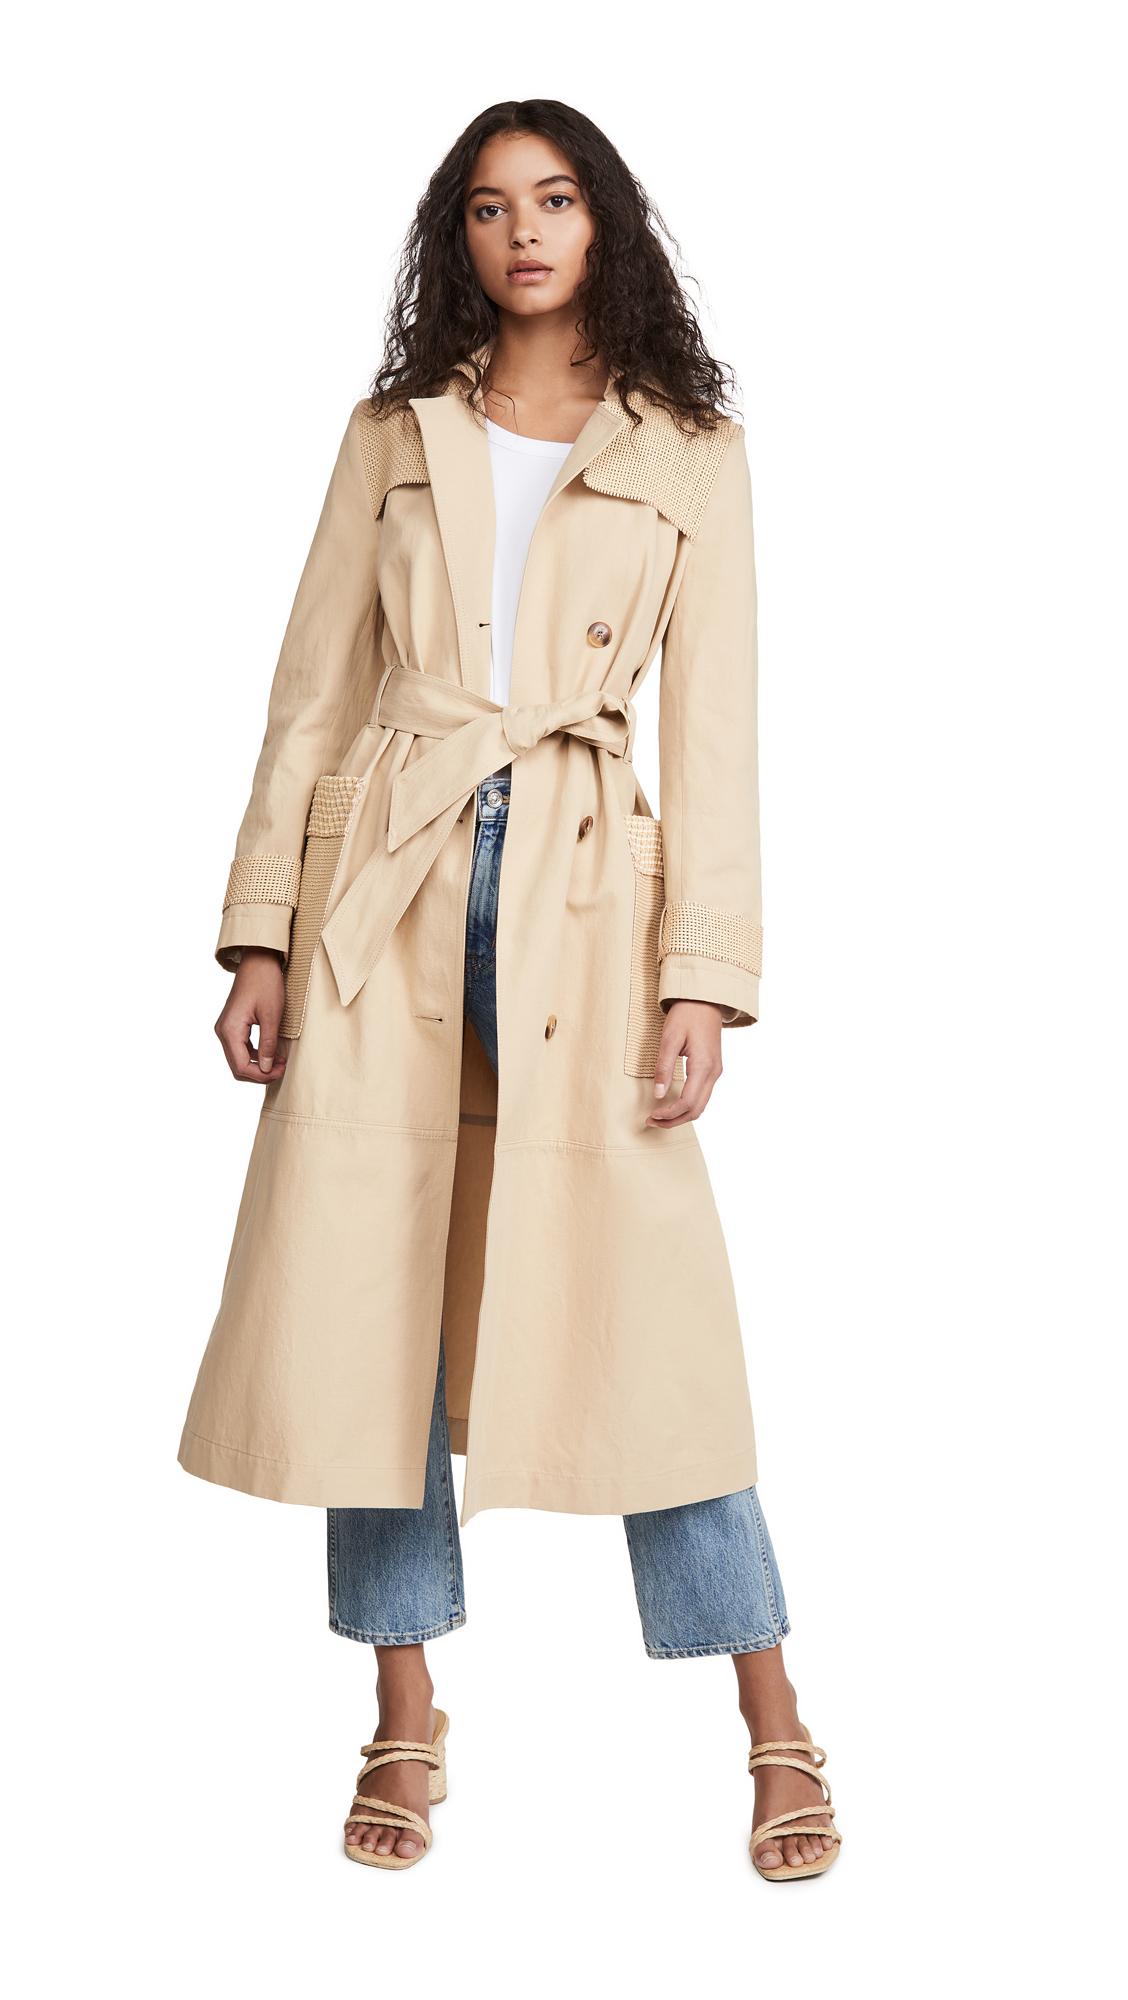 Buy Nanushka Alex Trench online beautiful Nanushka Jackets, Coats, Trench Coats